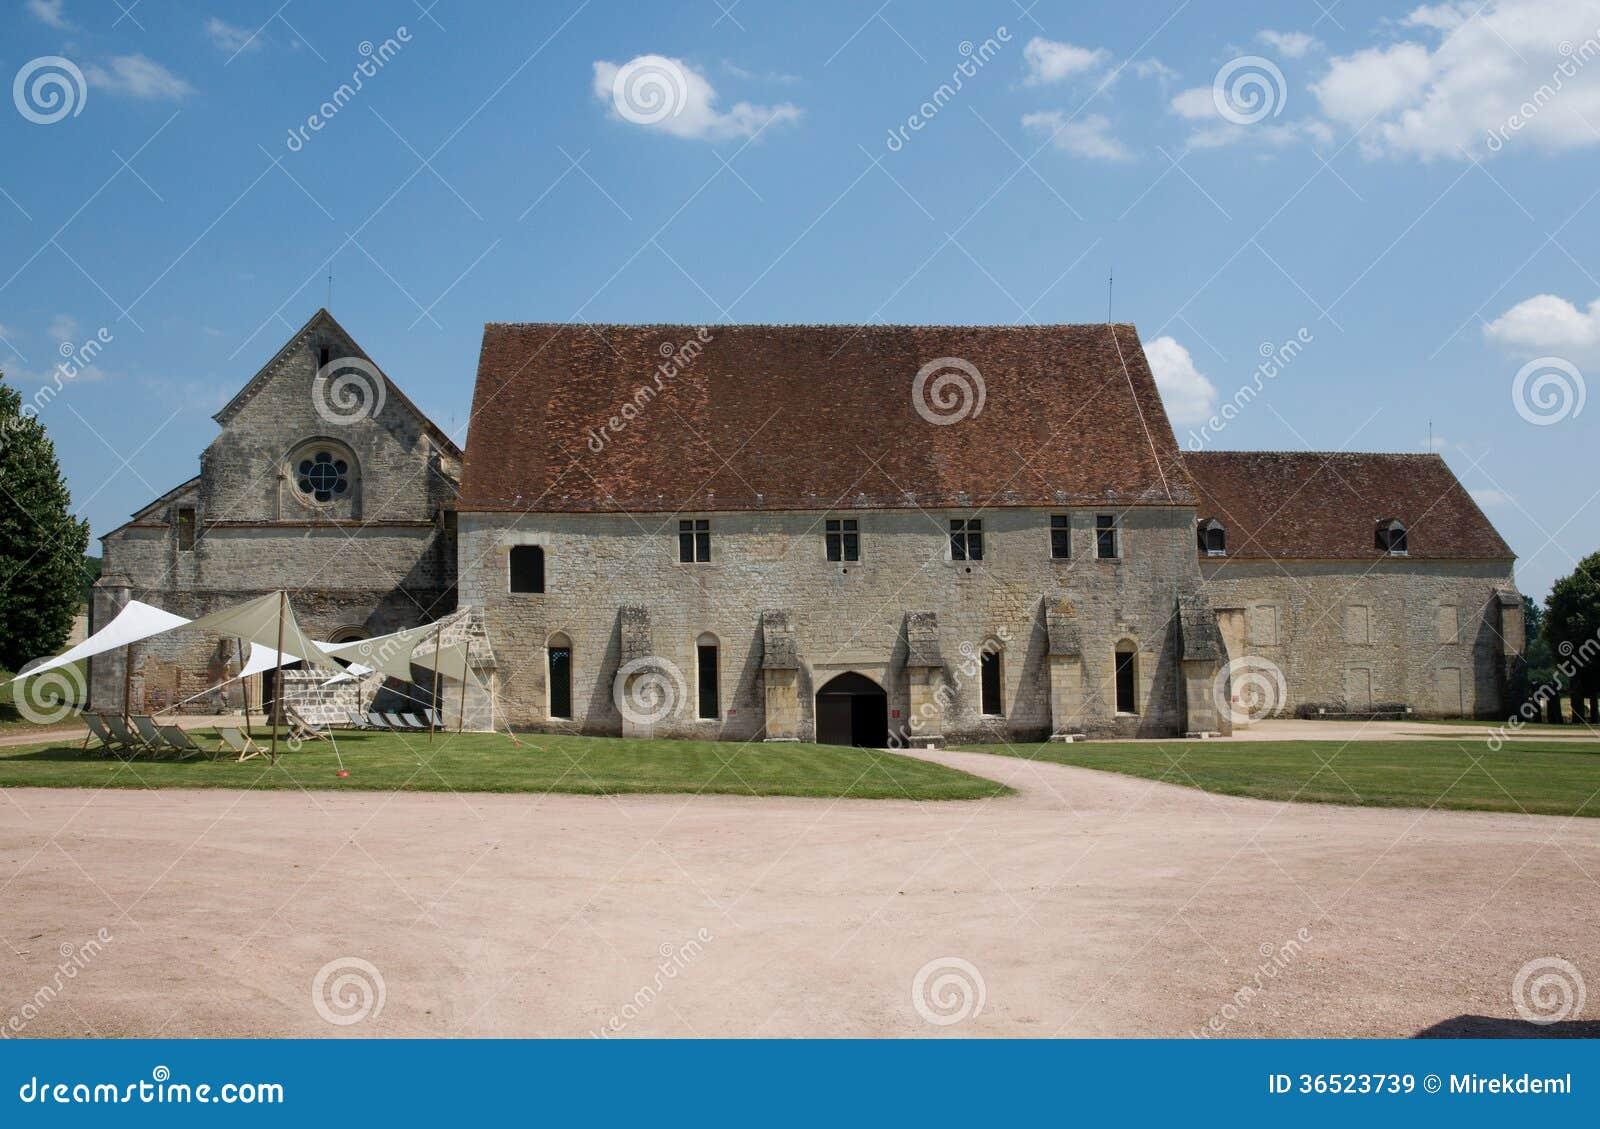 Noirlac, France